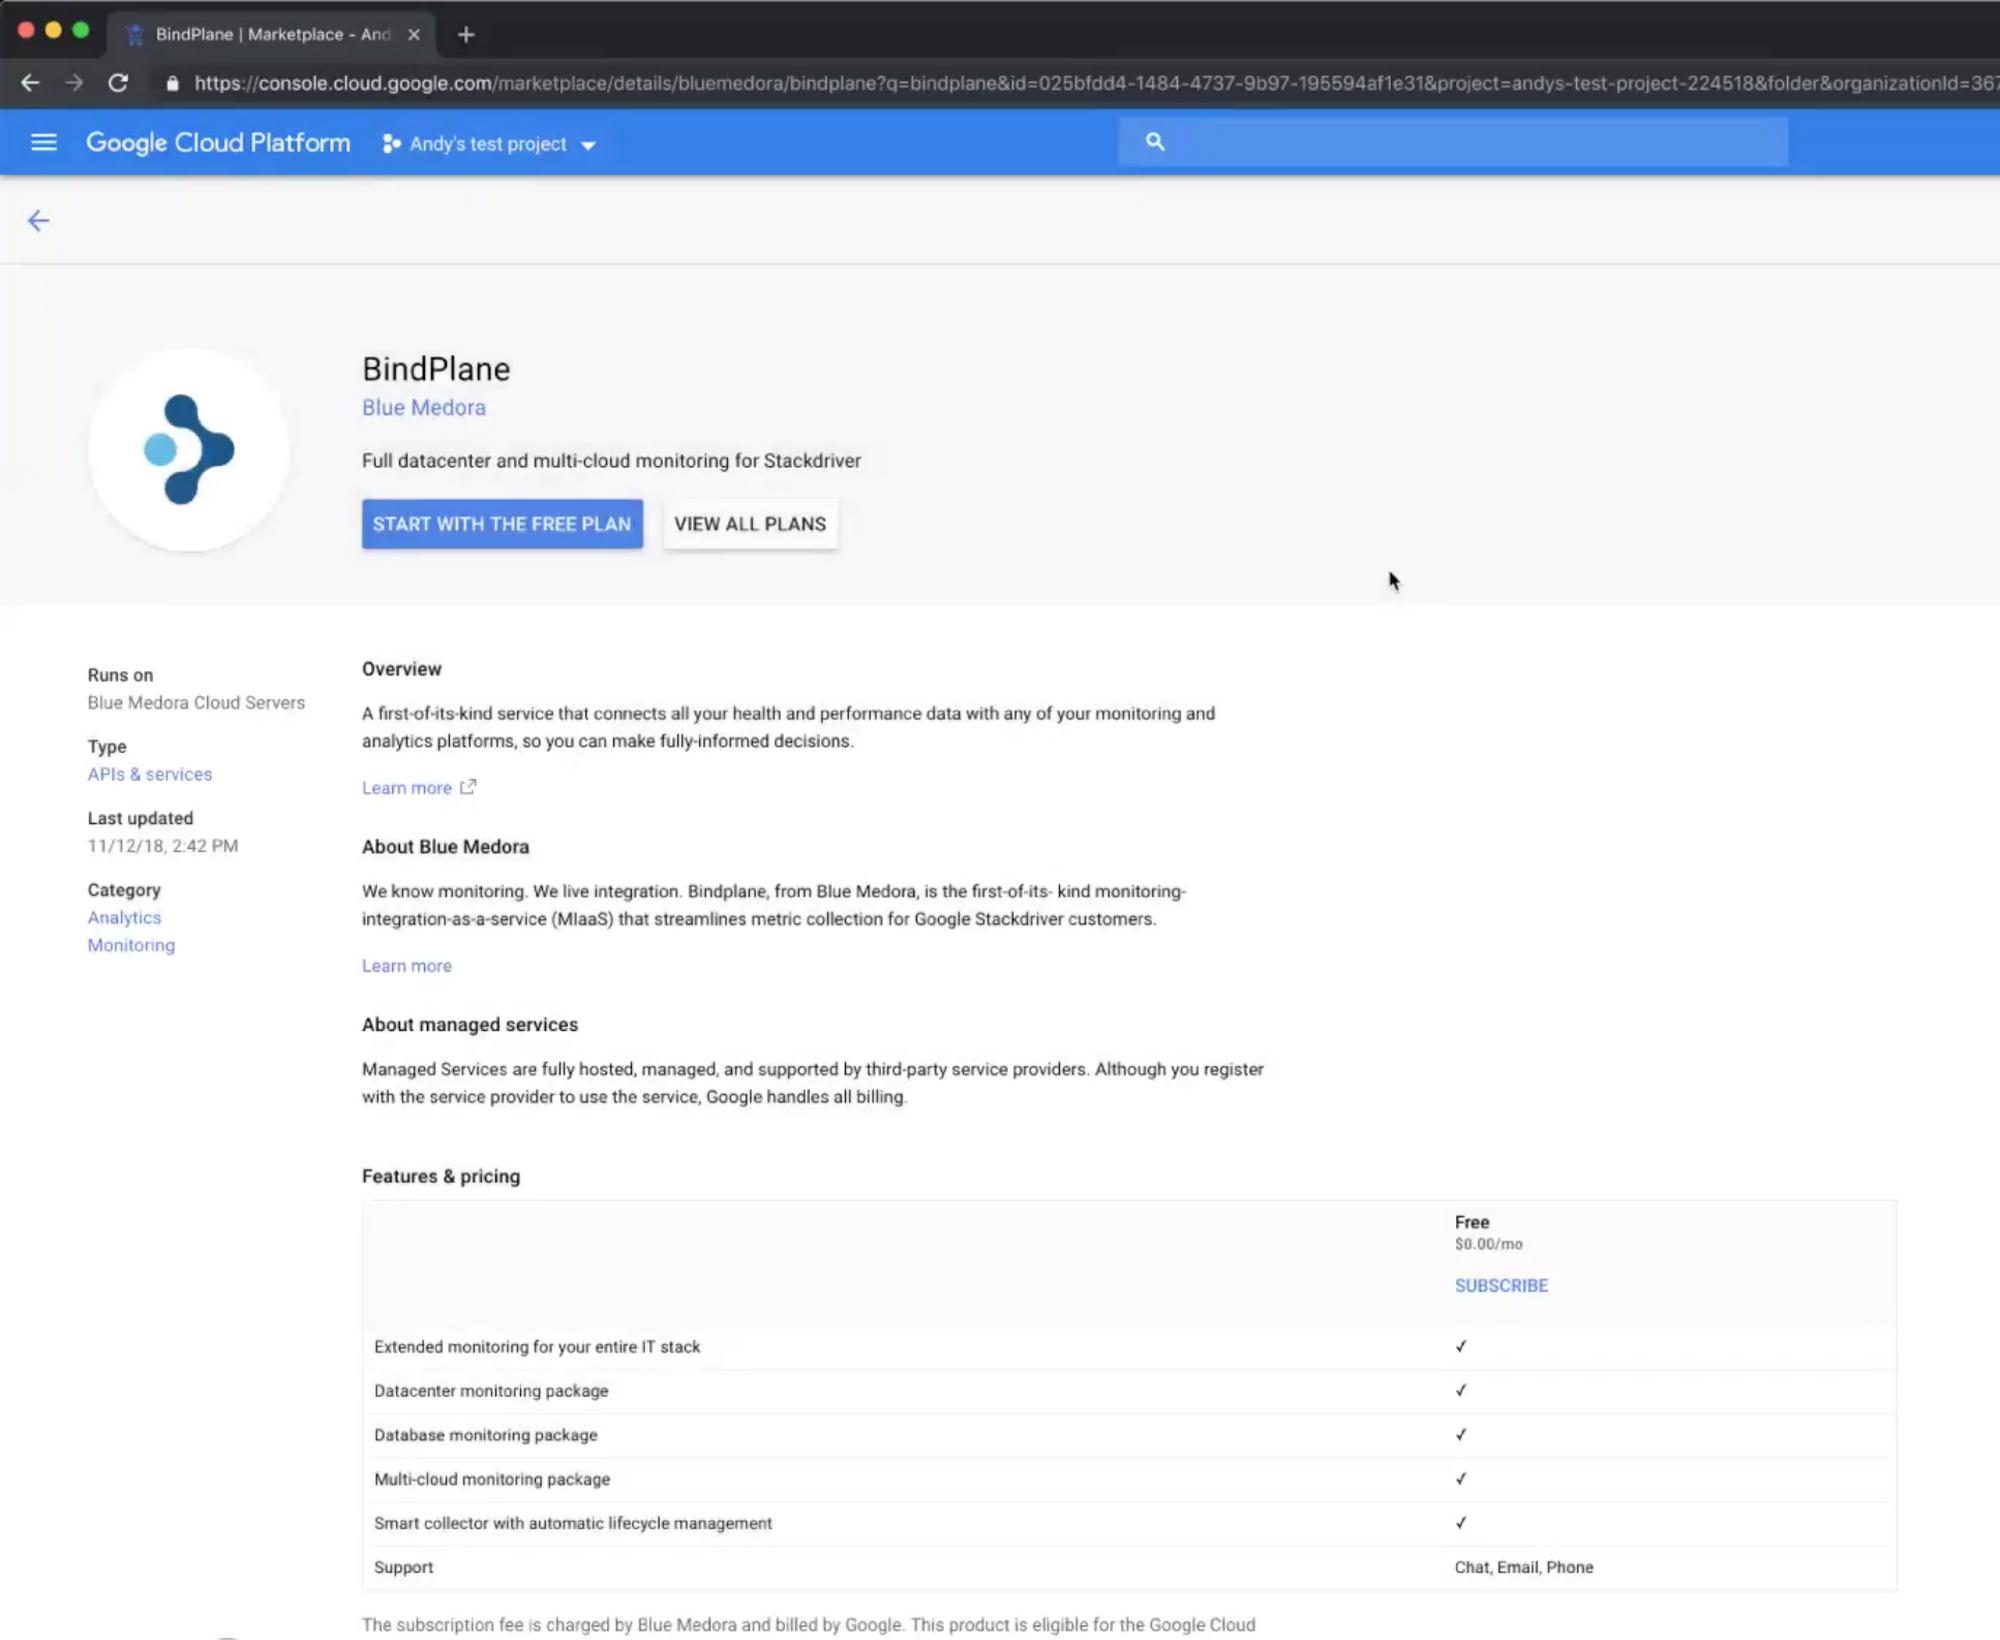 BindPlane listing in the Google Cloud Marketplace.png